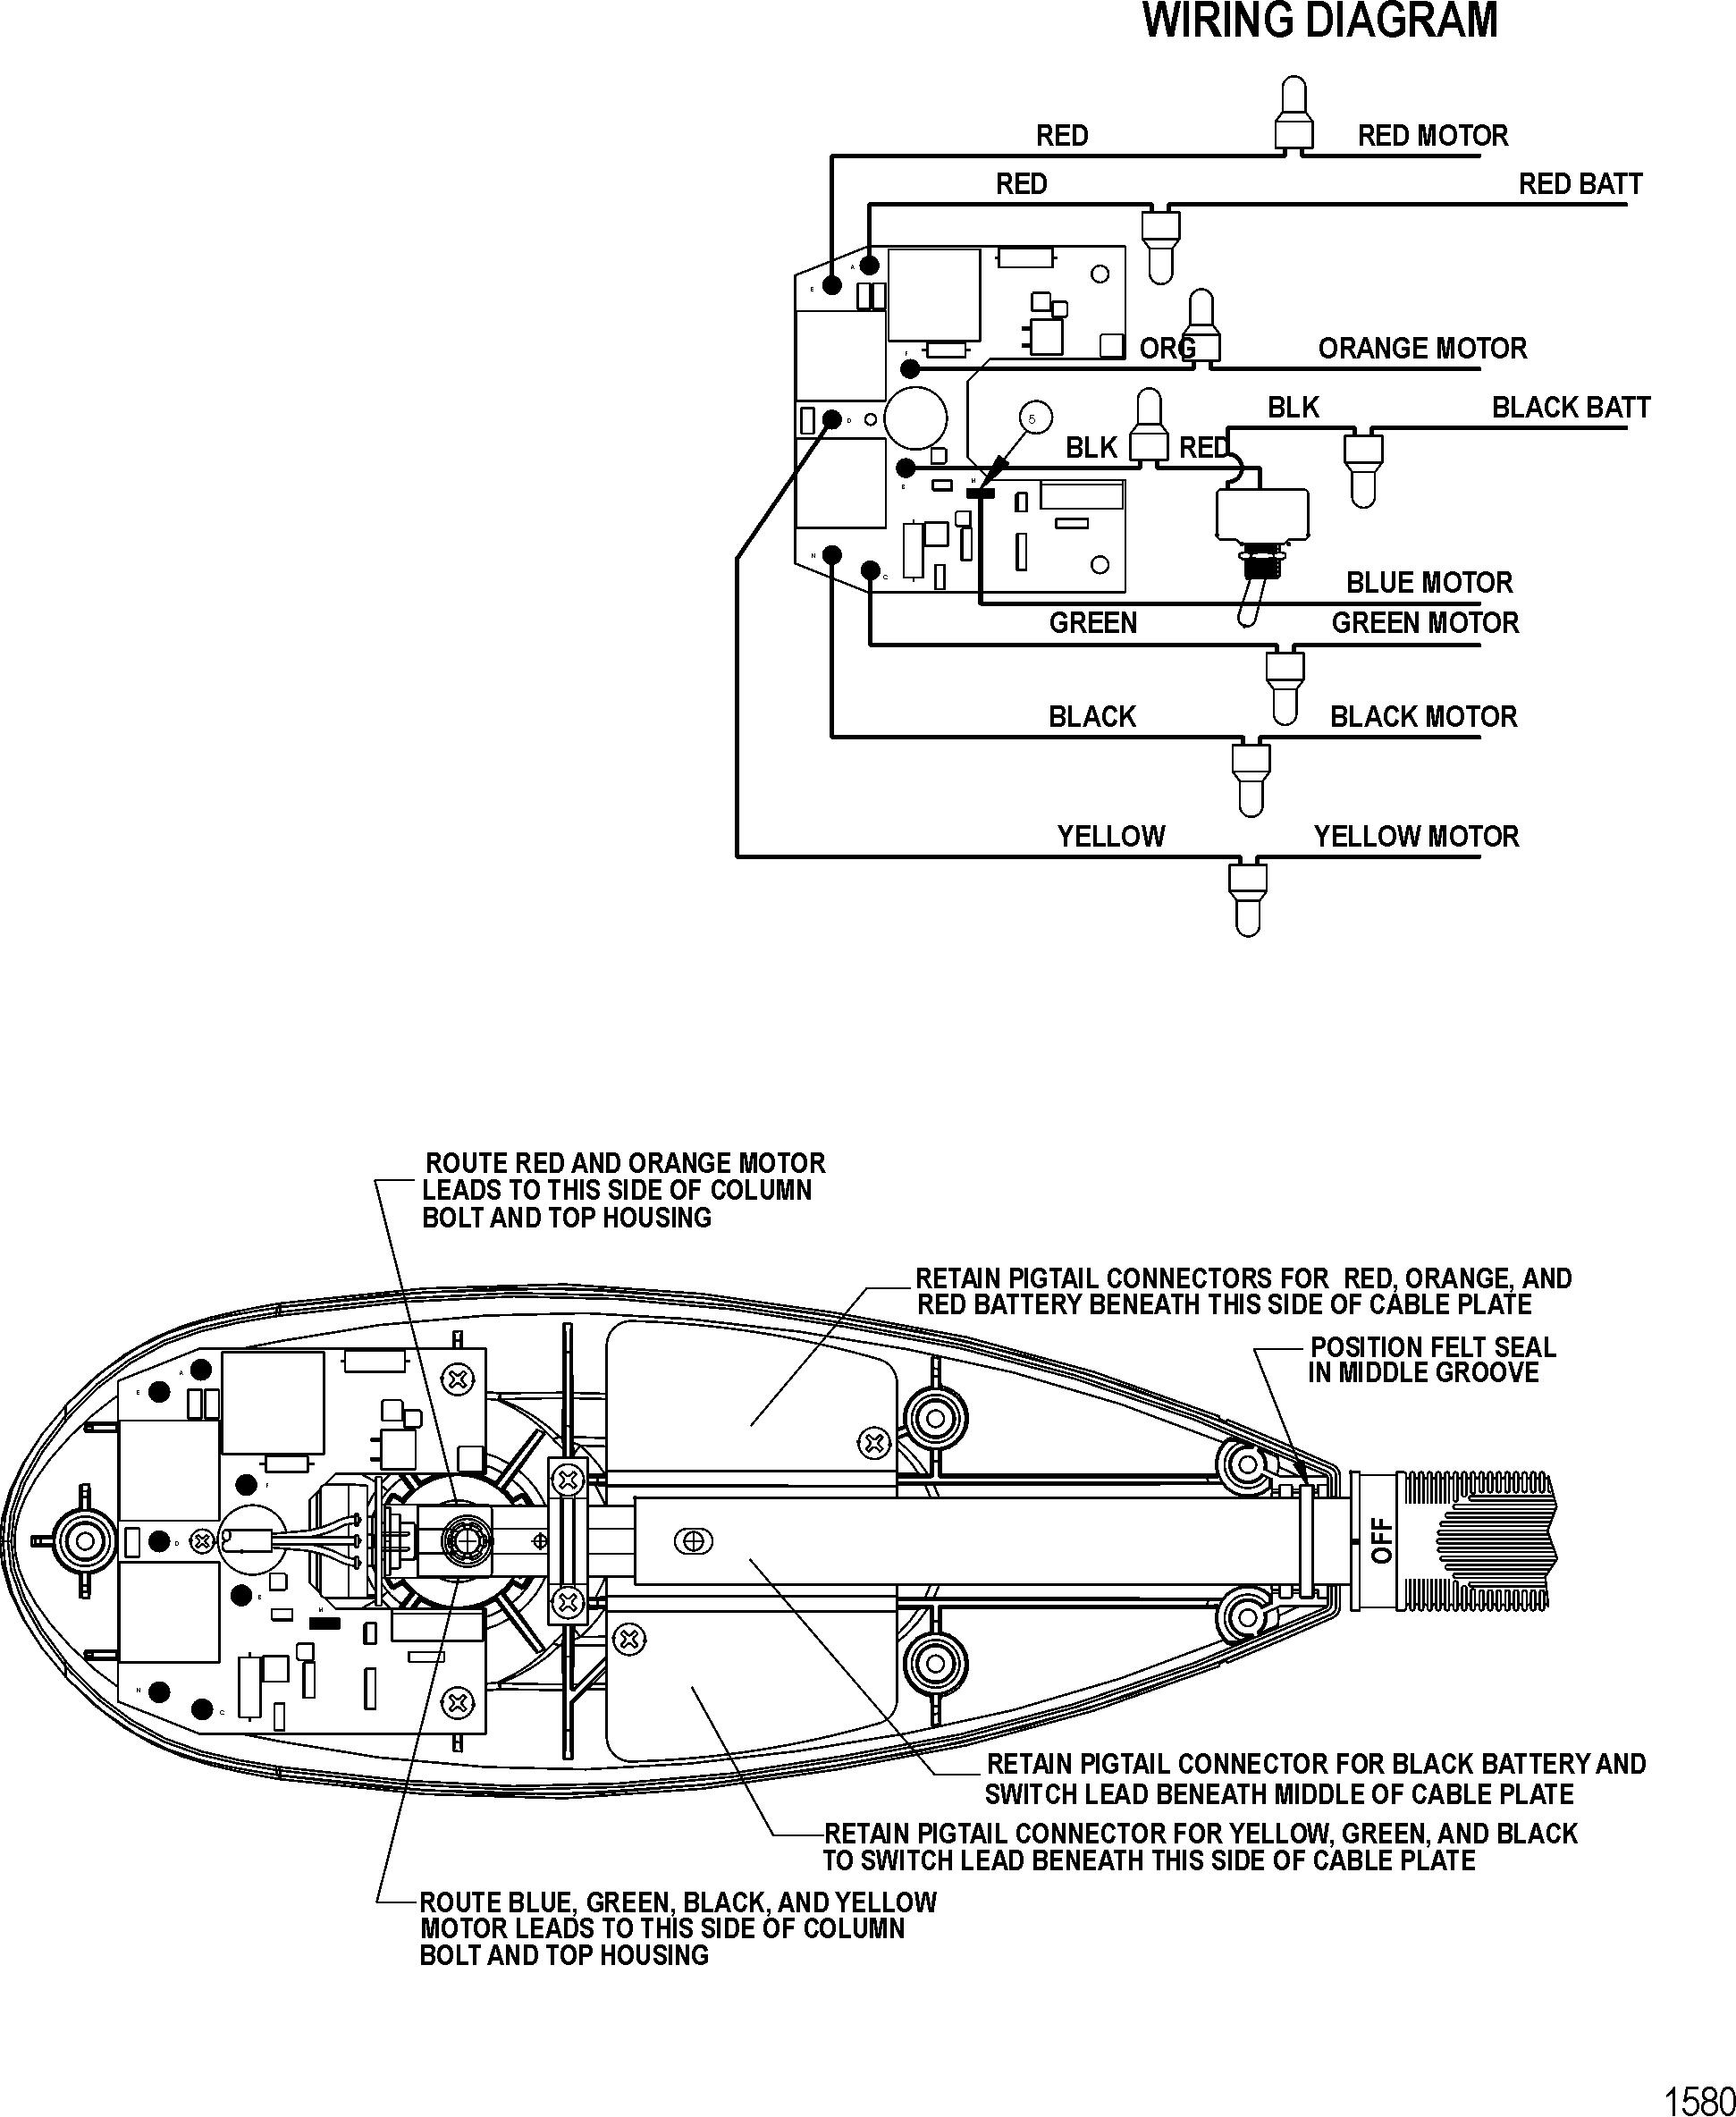 Motorguide Trolling Motor Wiring Diagram : Motorguide varimax wiring diagram somurich